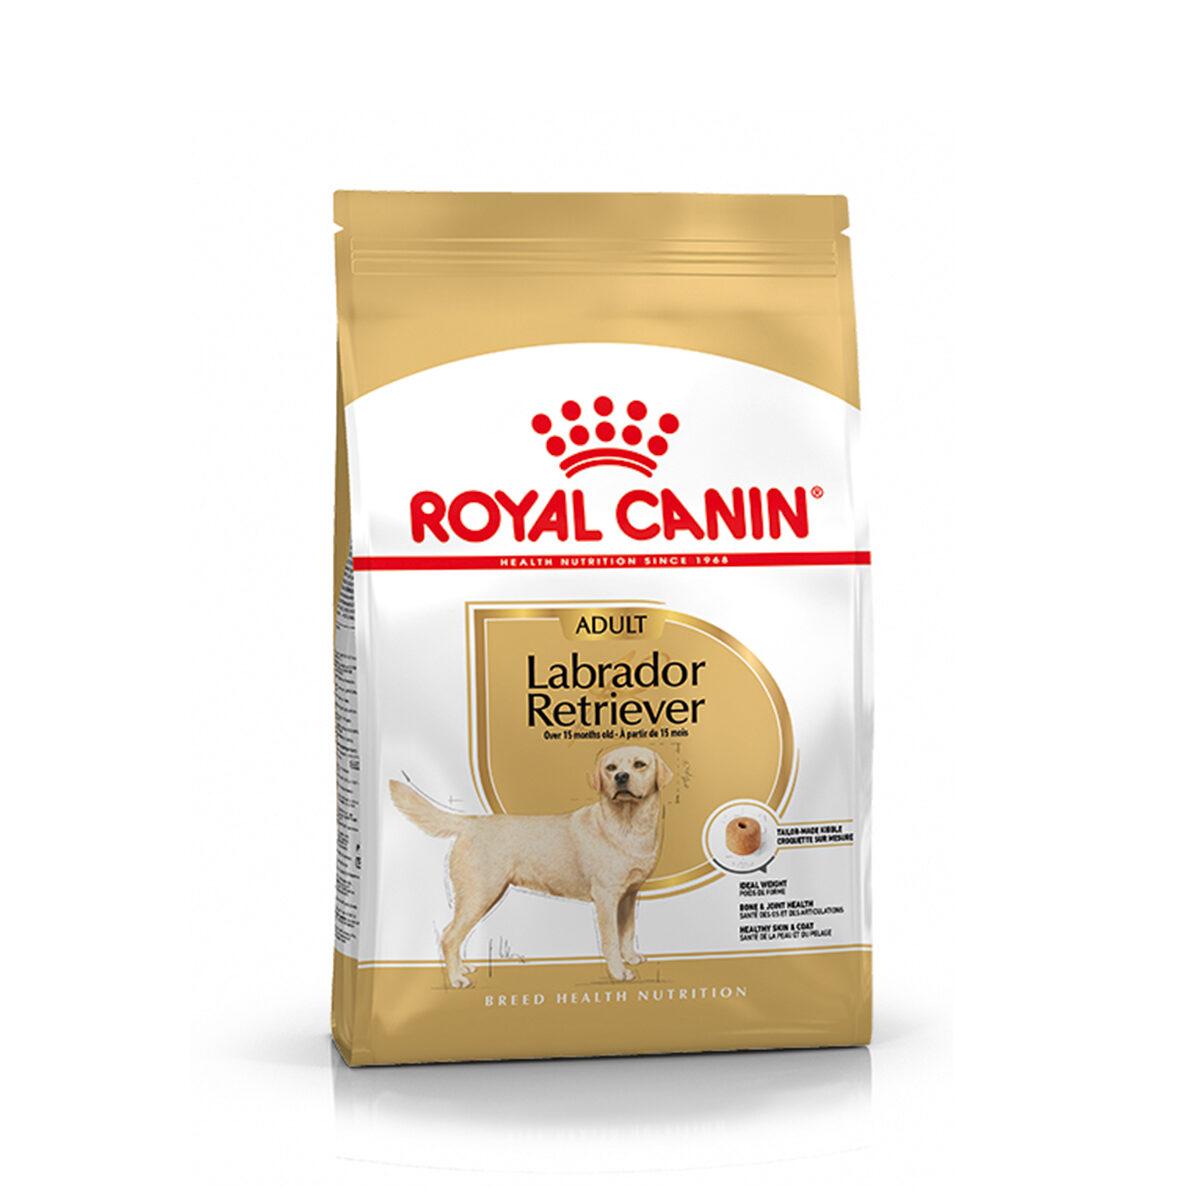 Royal Canin Labrador Retriever Hondenvoer Adult 3kg